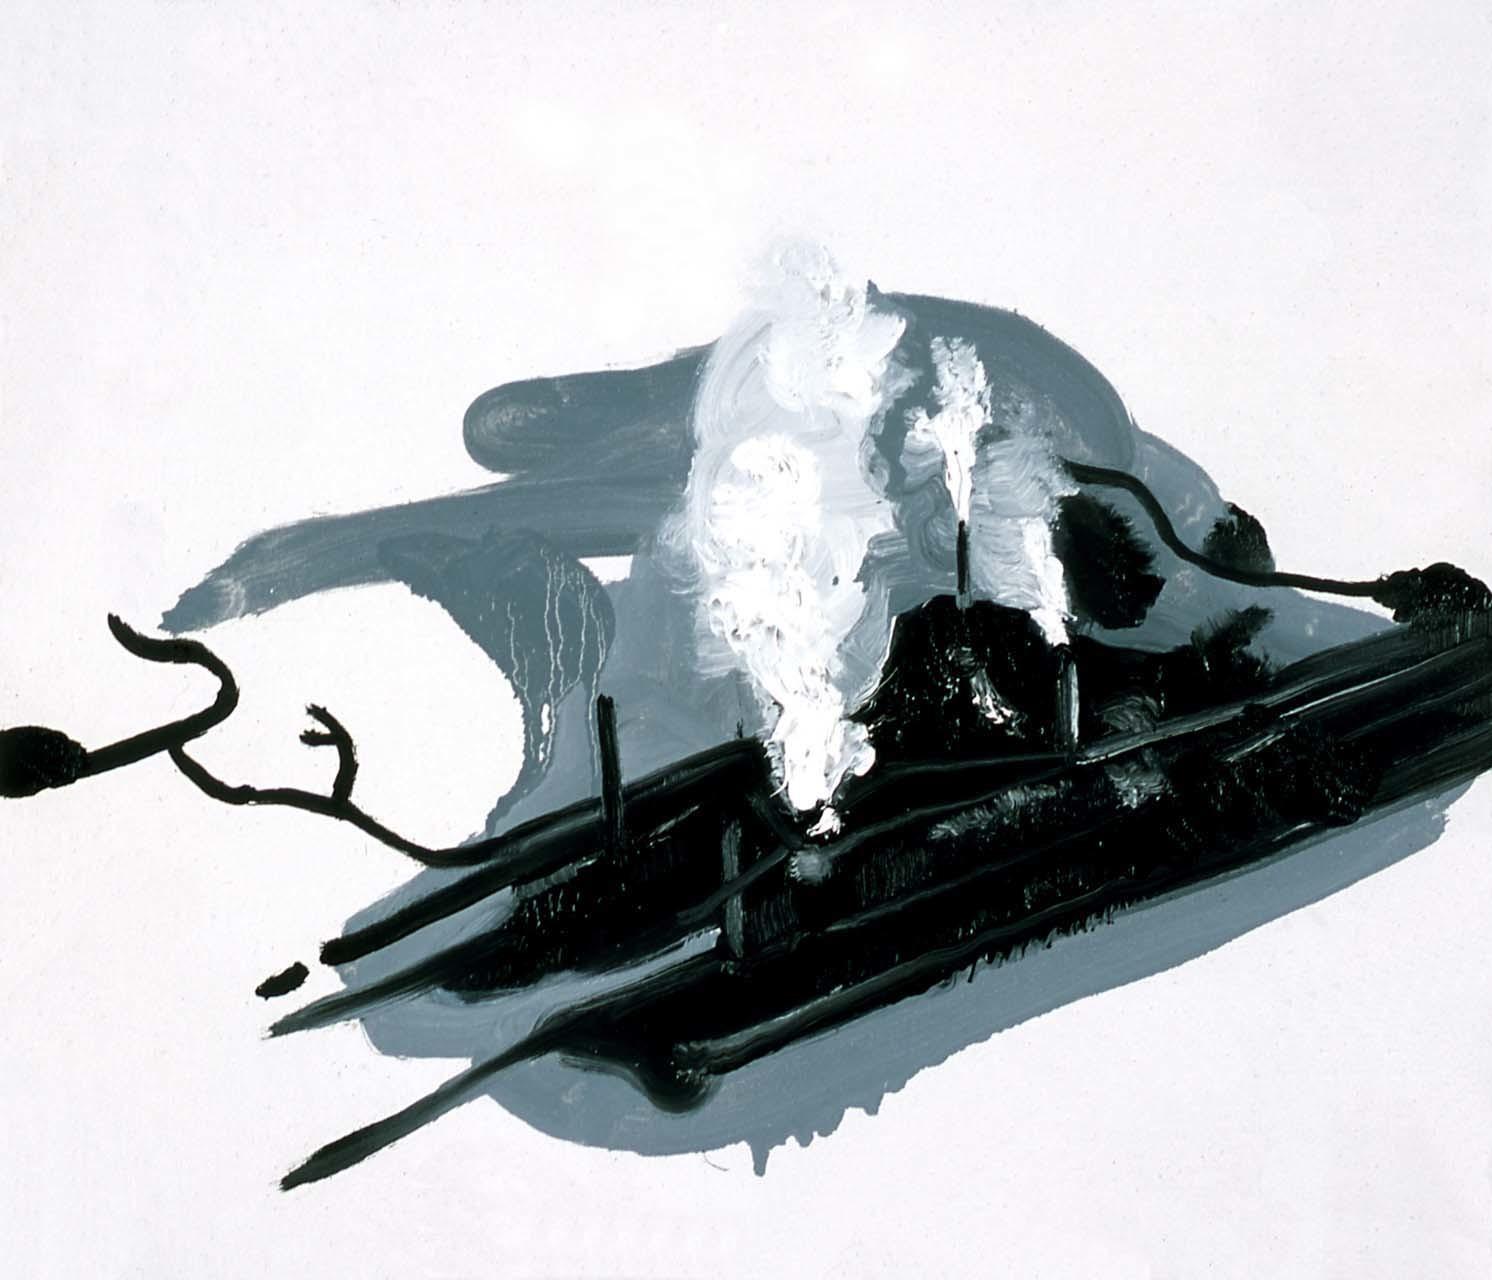 <p>Untitled (Chicago), 2003</p>